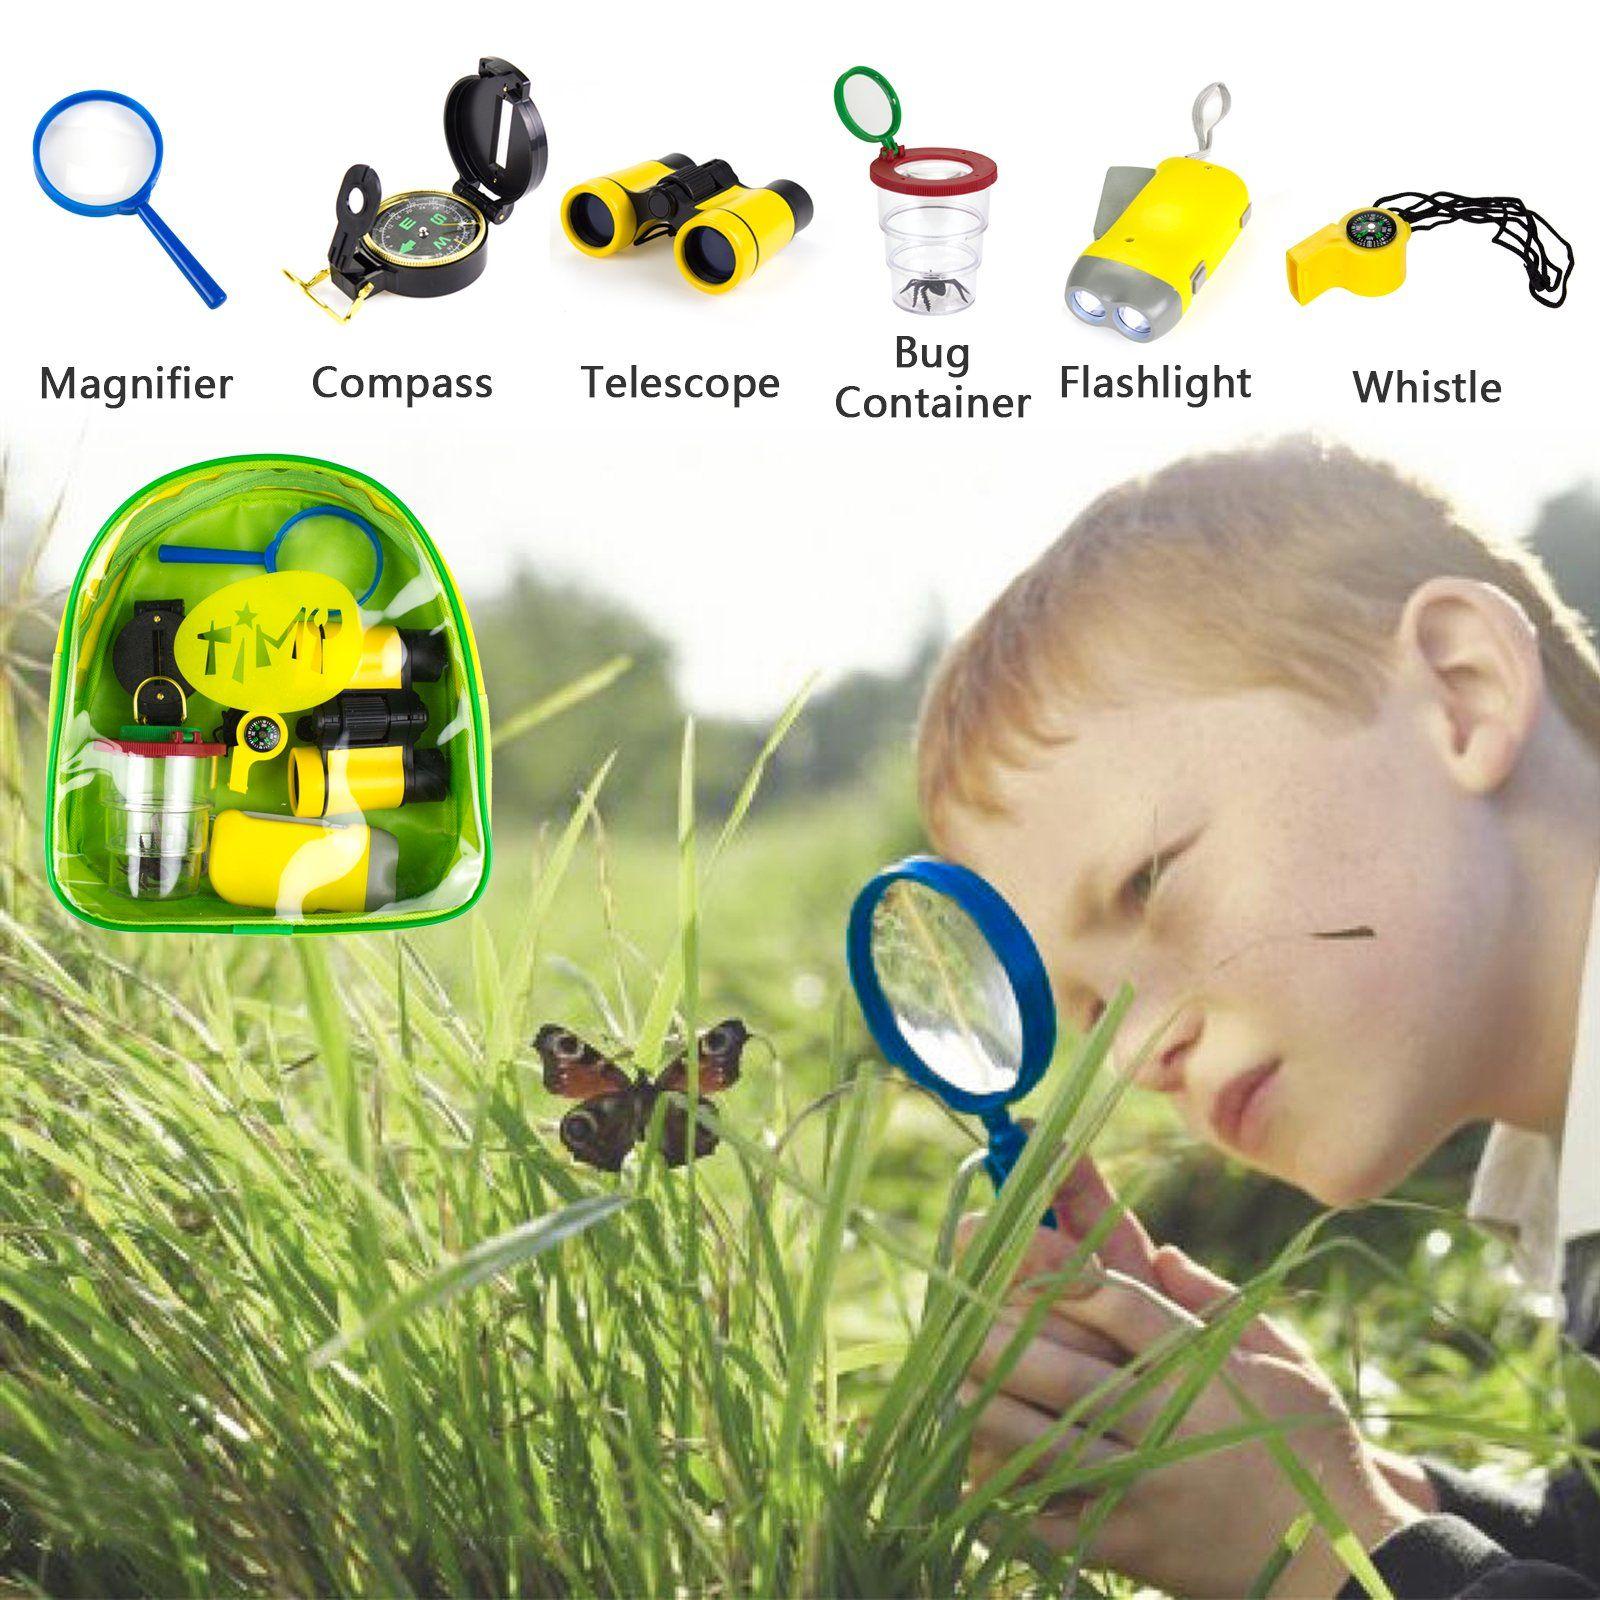 timy 6 in 1 outdoor exploration kit for kids adventurer